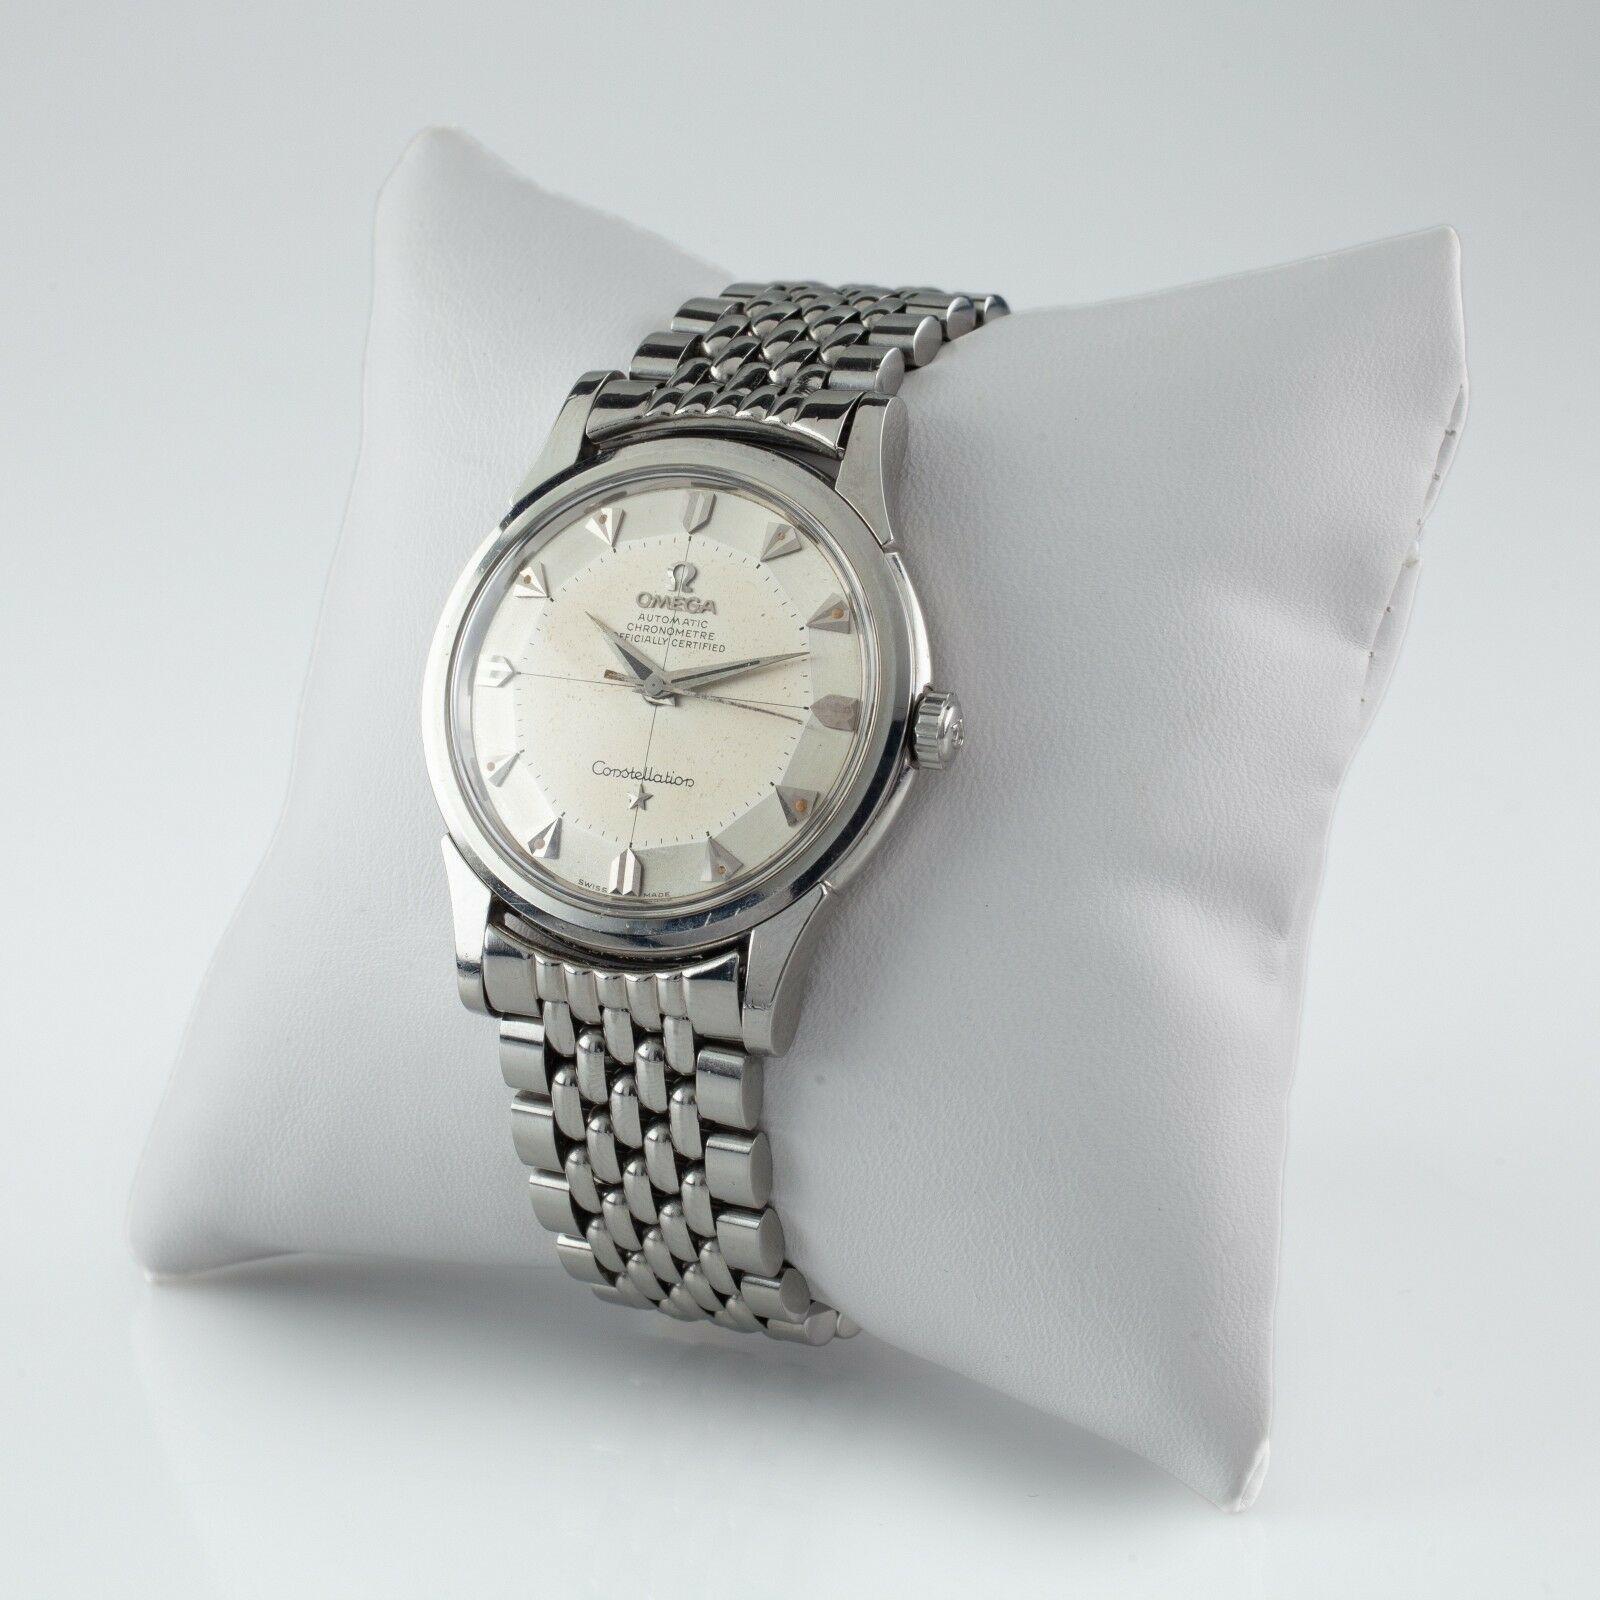 Omega Vintage Constellation Pie Pan Stainless Steel Watch #551 #14381